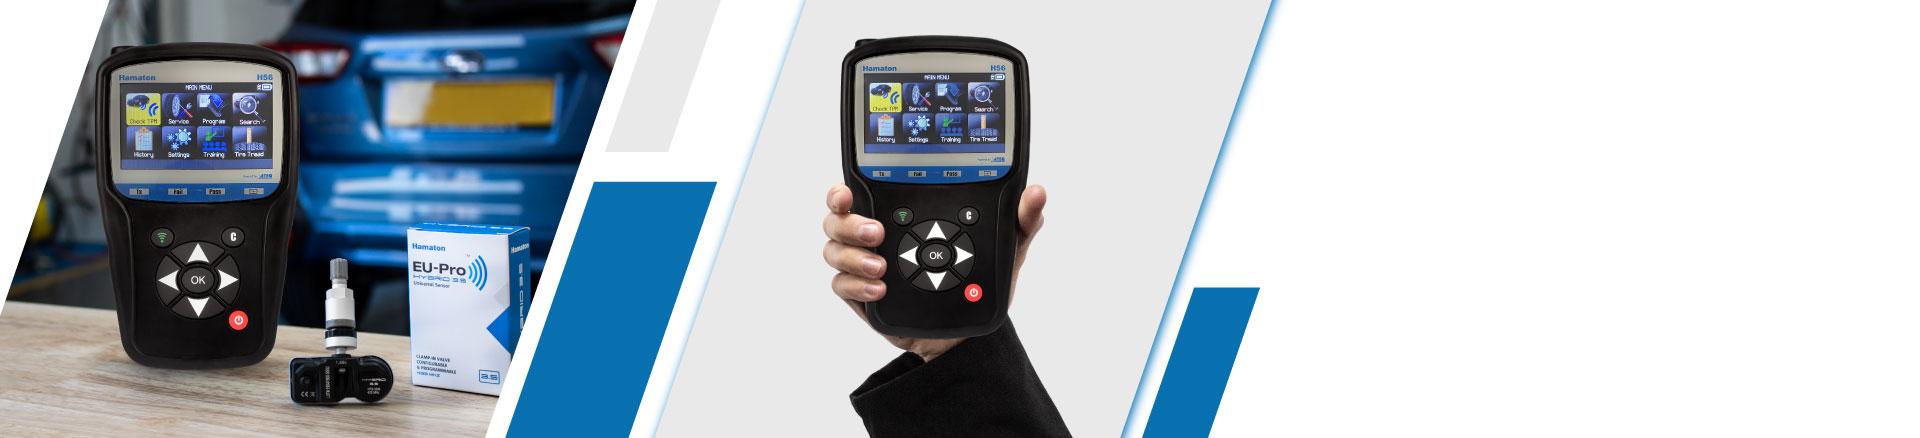 H56 TPMS Tool